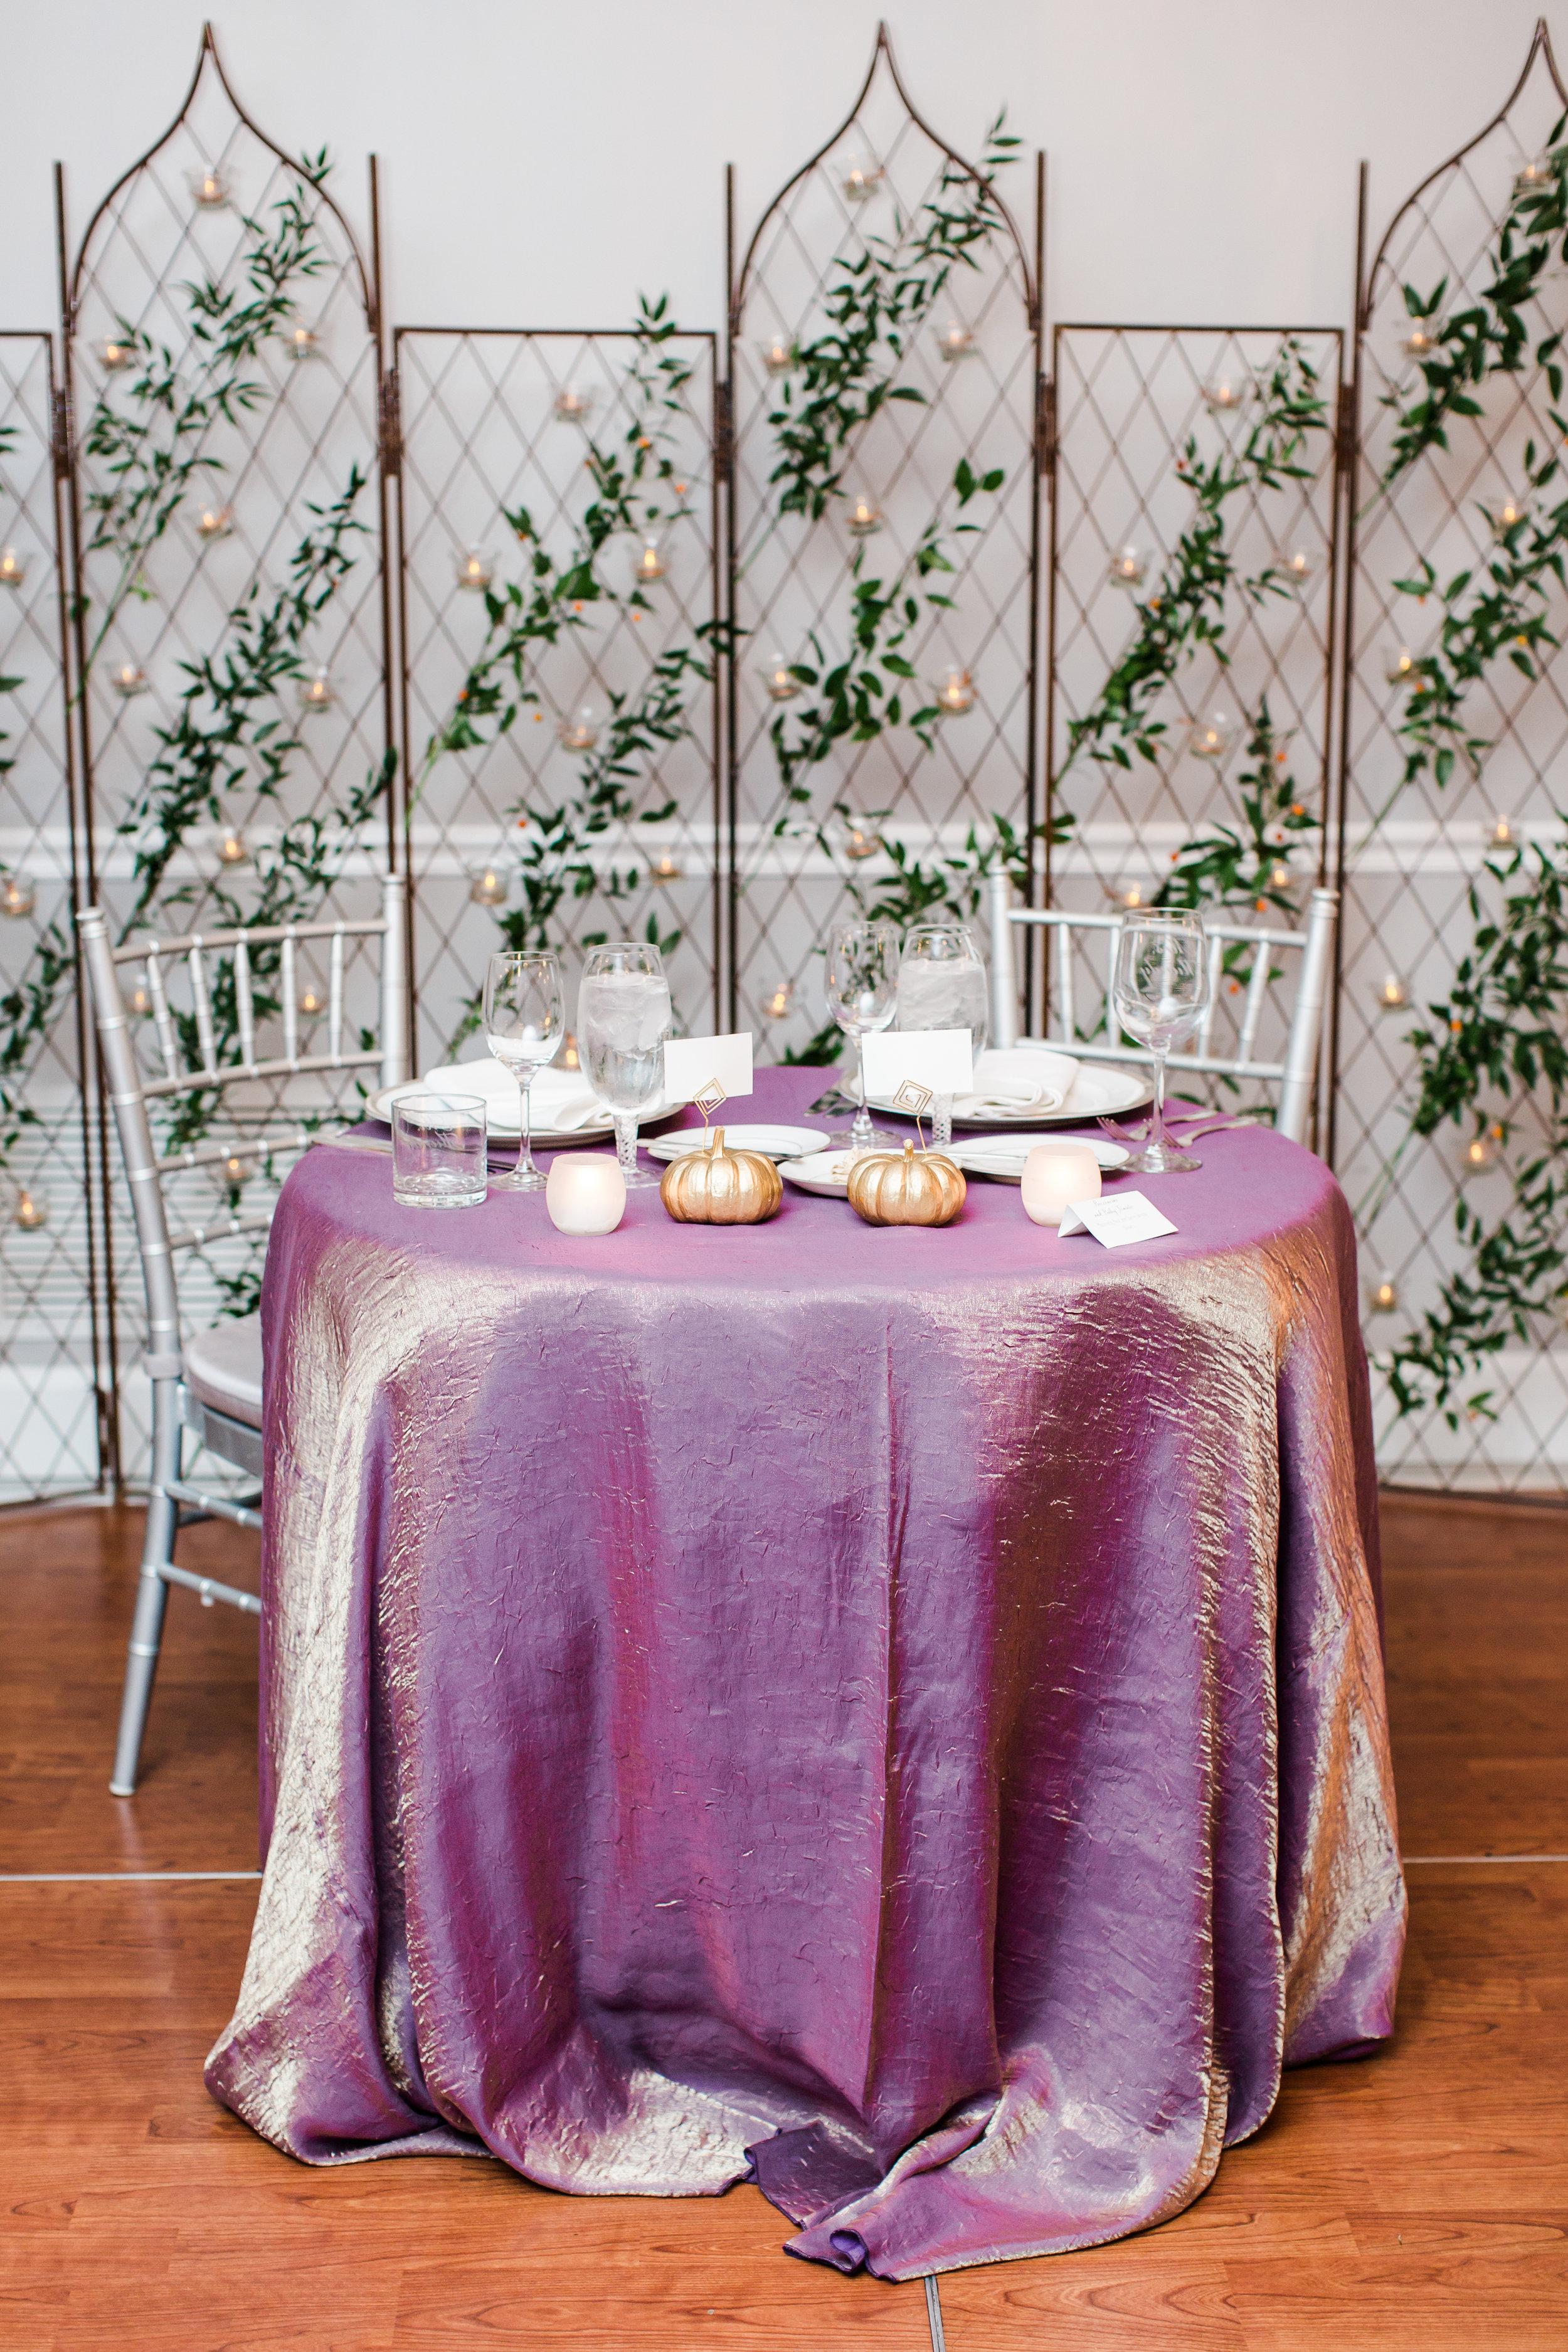 DavidAmandaMundy-Wedding-10282017-KathrynIvyPhotography-428.jpg